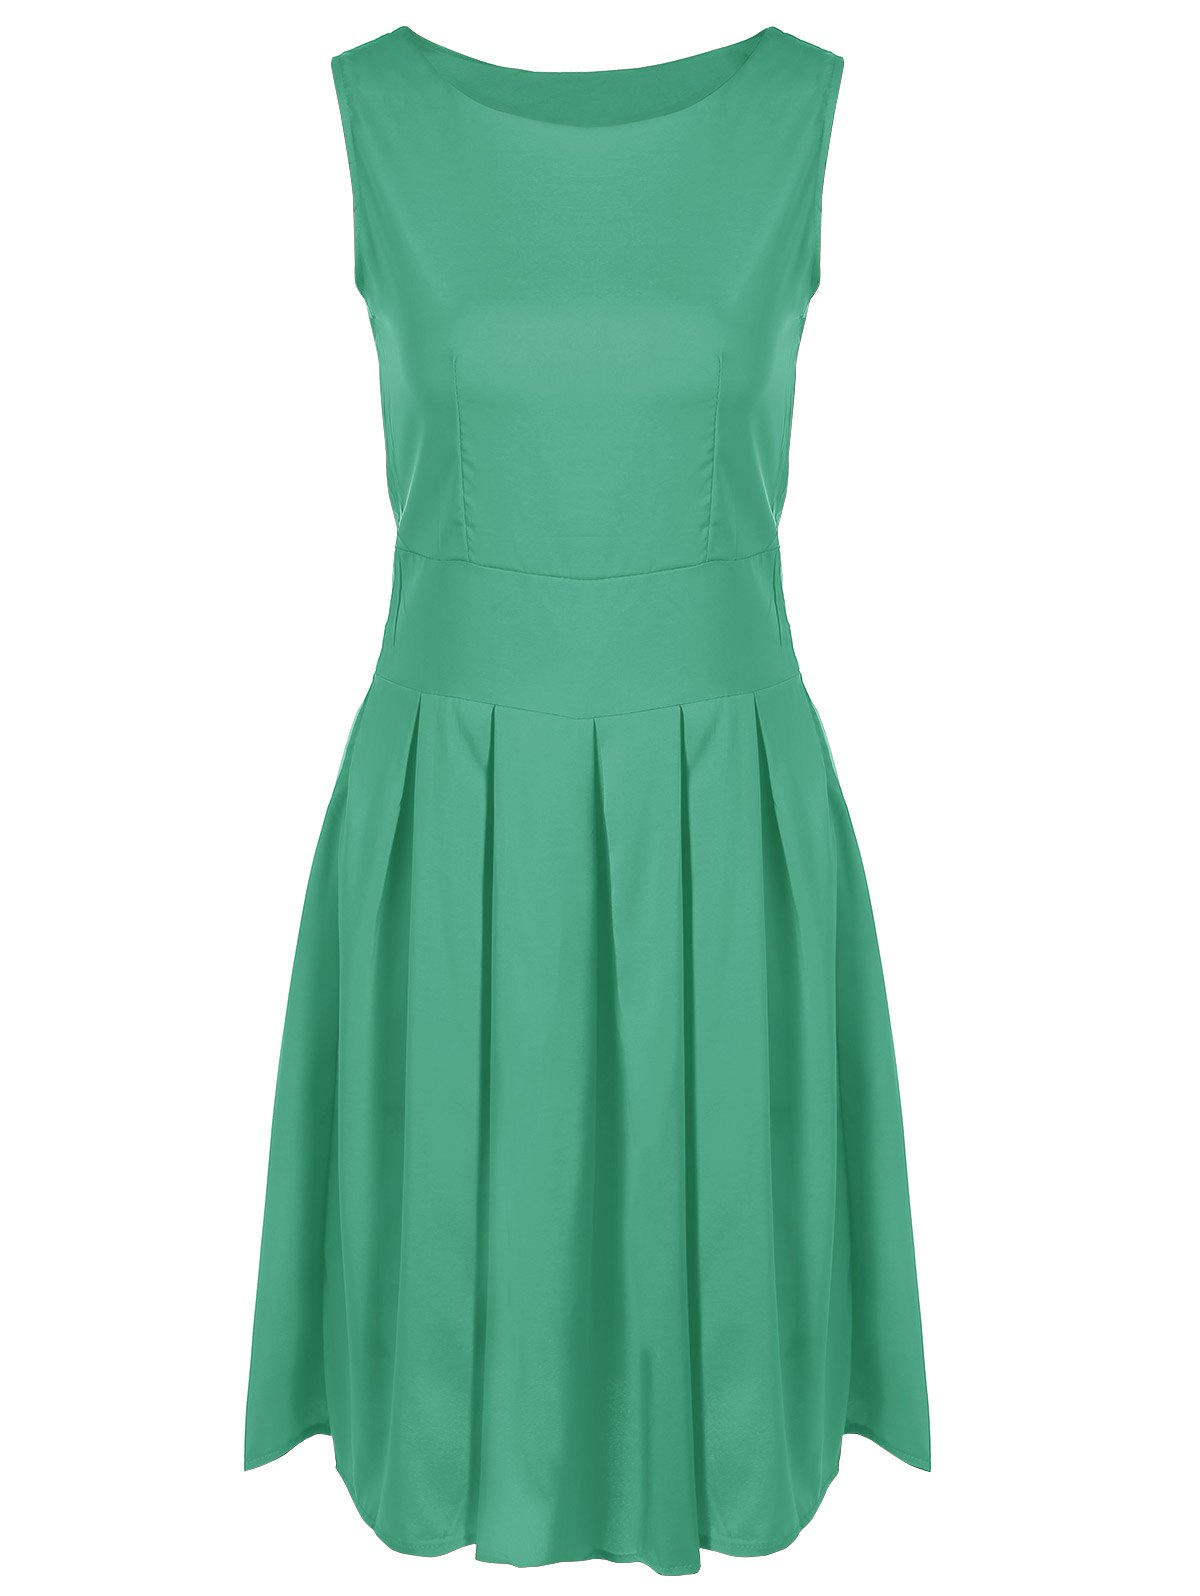 Scoop Neck Vintage Swing Dress